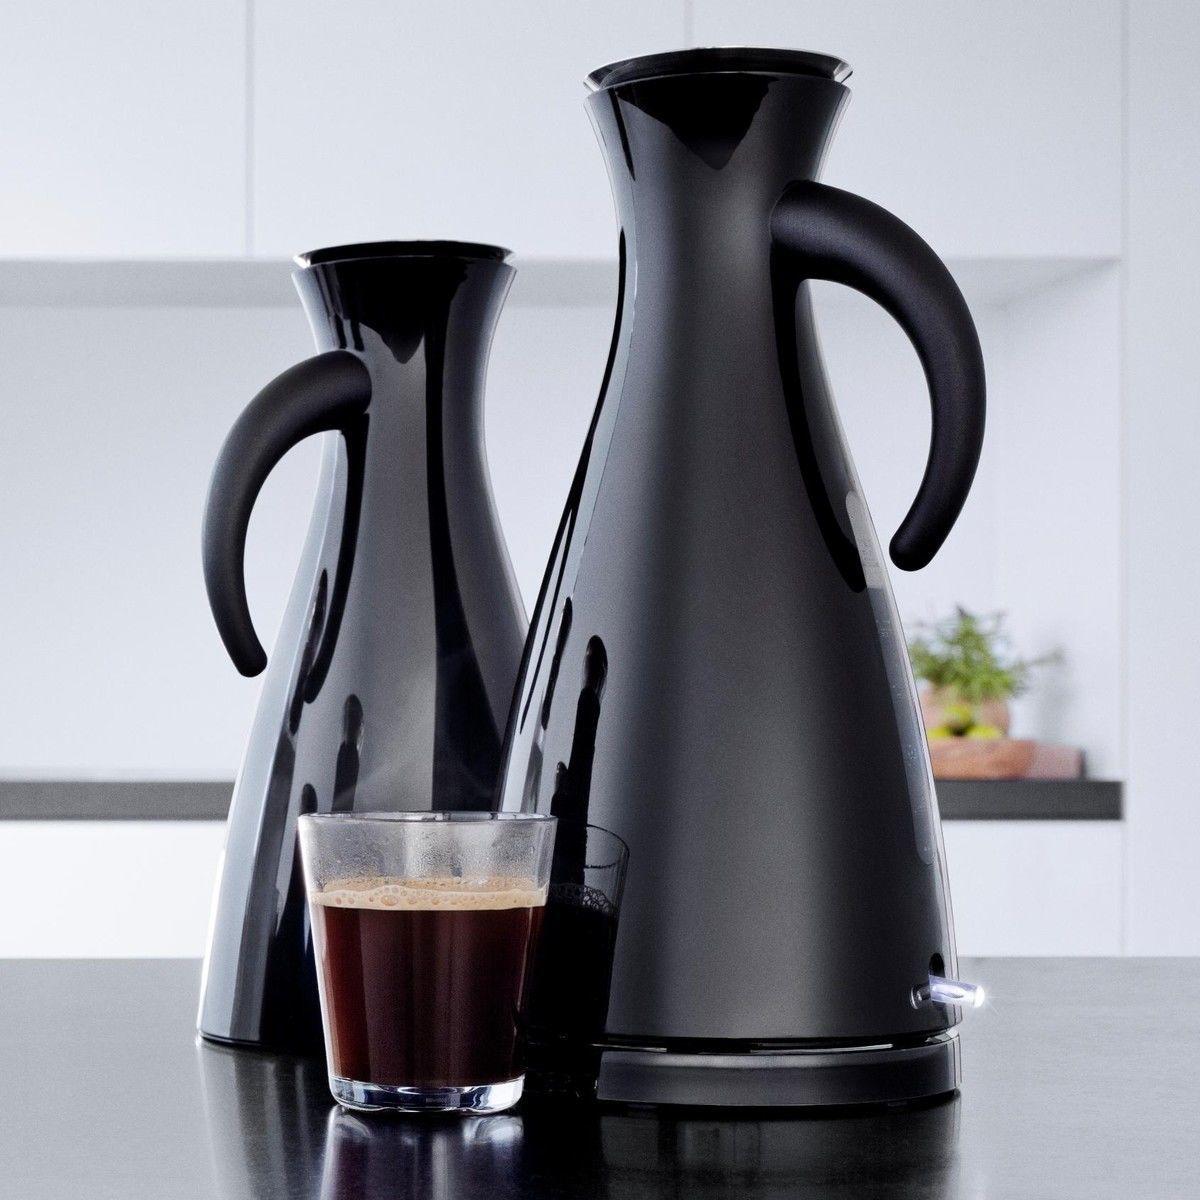 eva solo electric kettle eva solo. Black Bedroom Furniture Sets. Home Design Ideas